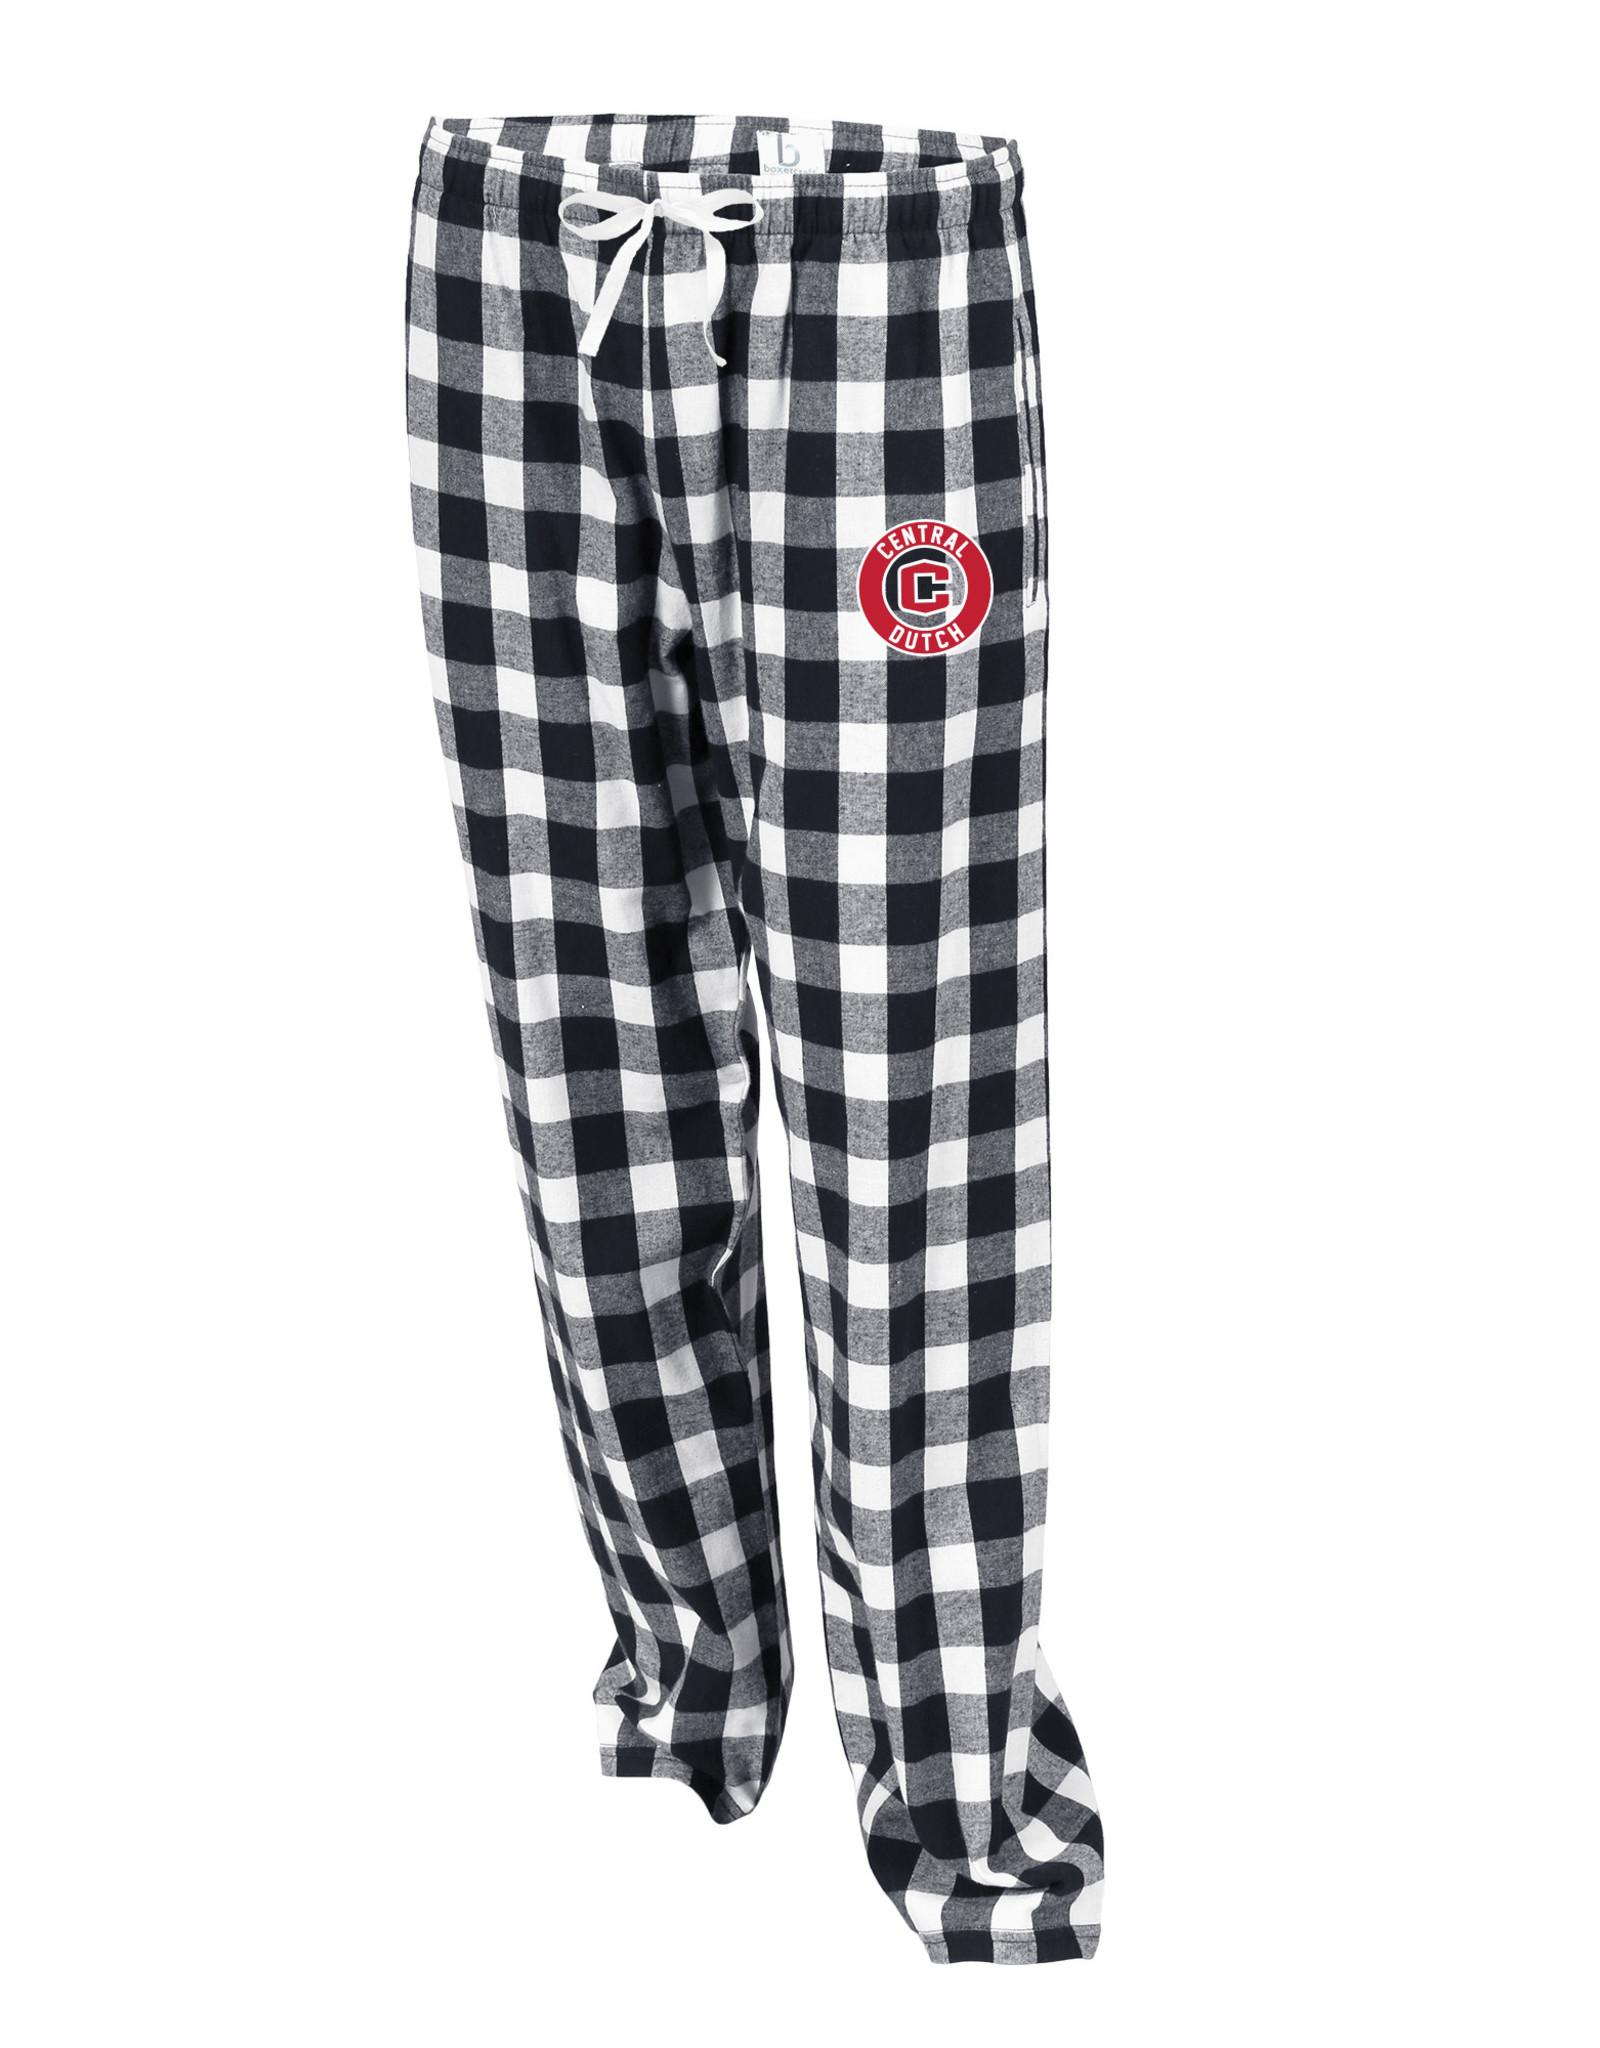 Boxercraft Boxercraft Flannel Pants B/W